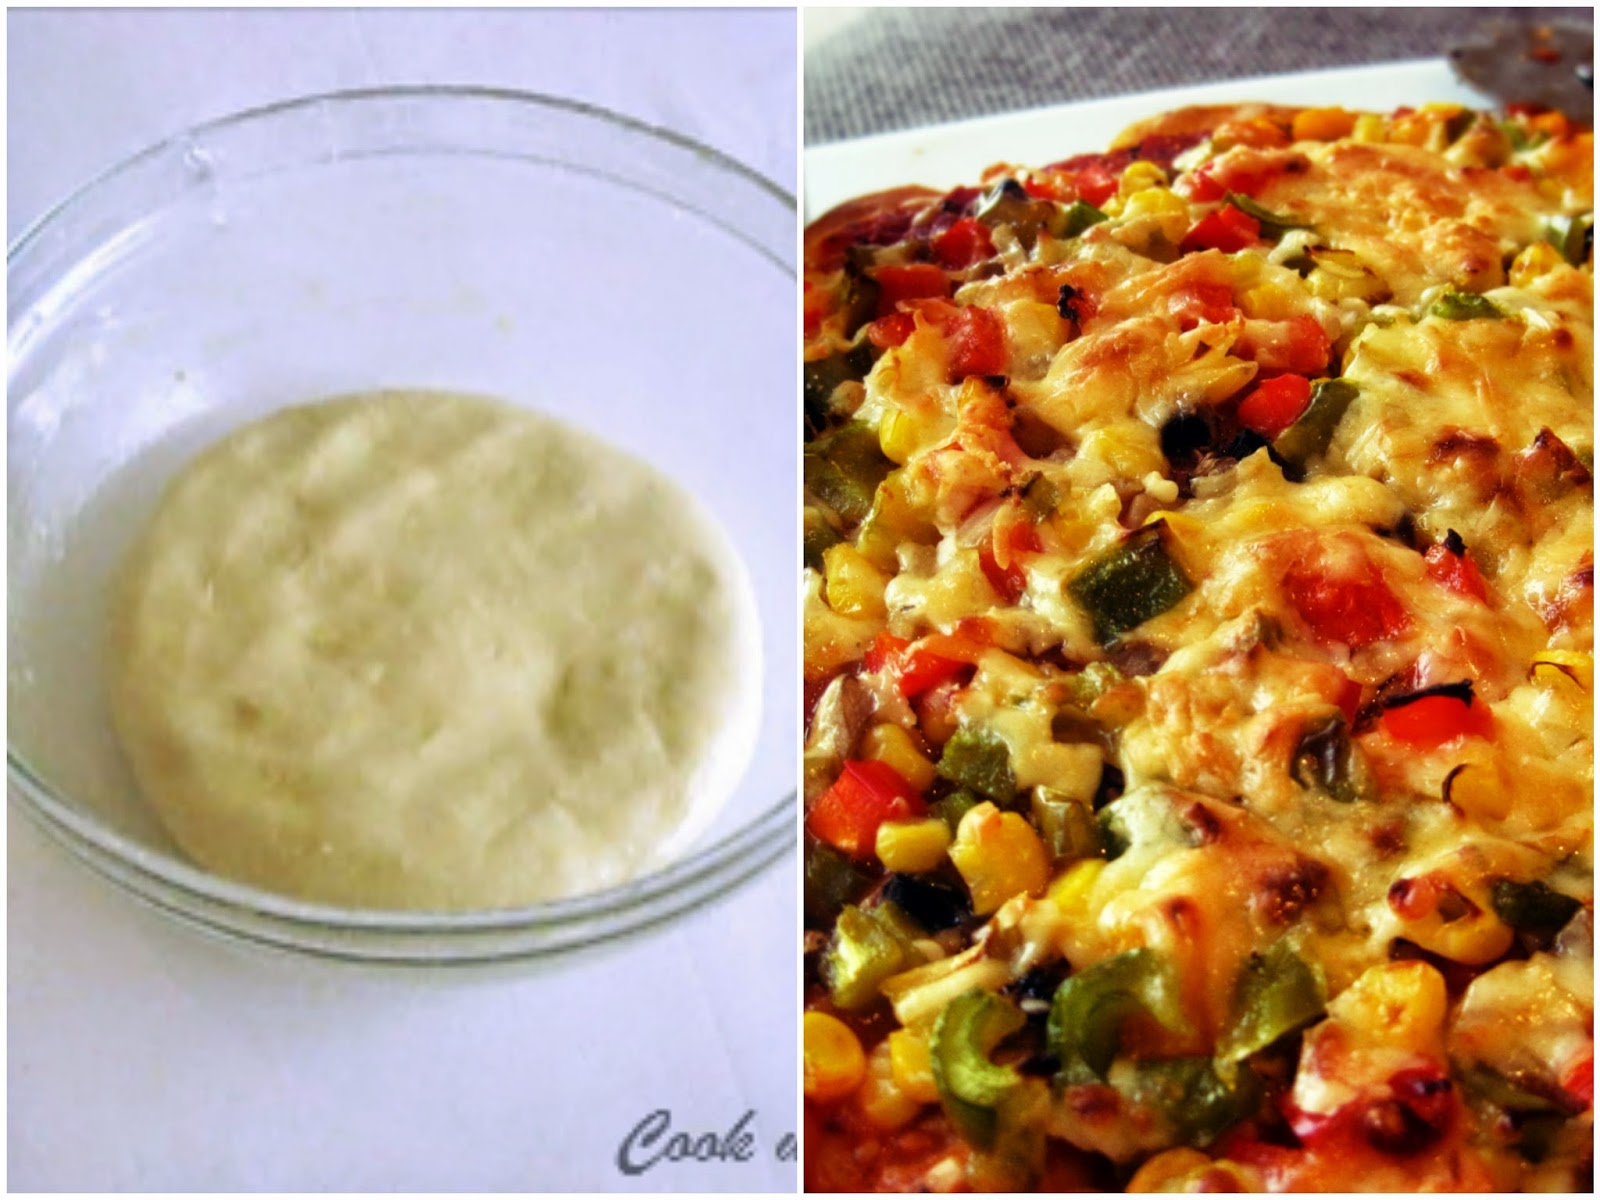 http://cookwithpriyankavarma.blogspot.co.uk/2014/03/pizza-dough.html